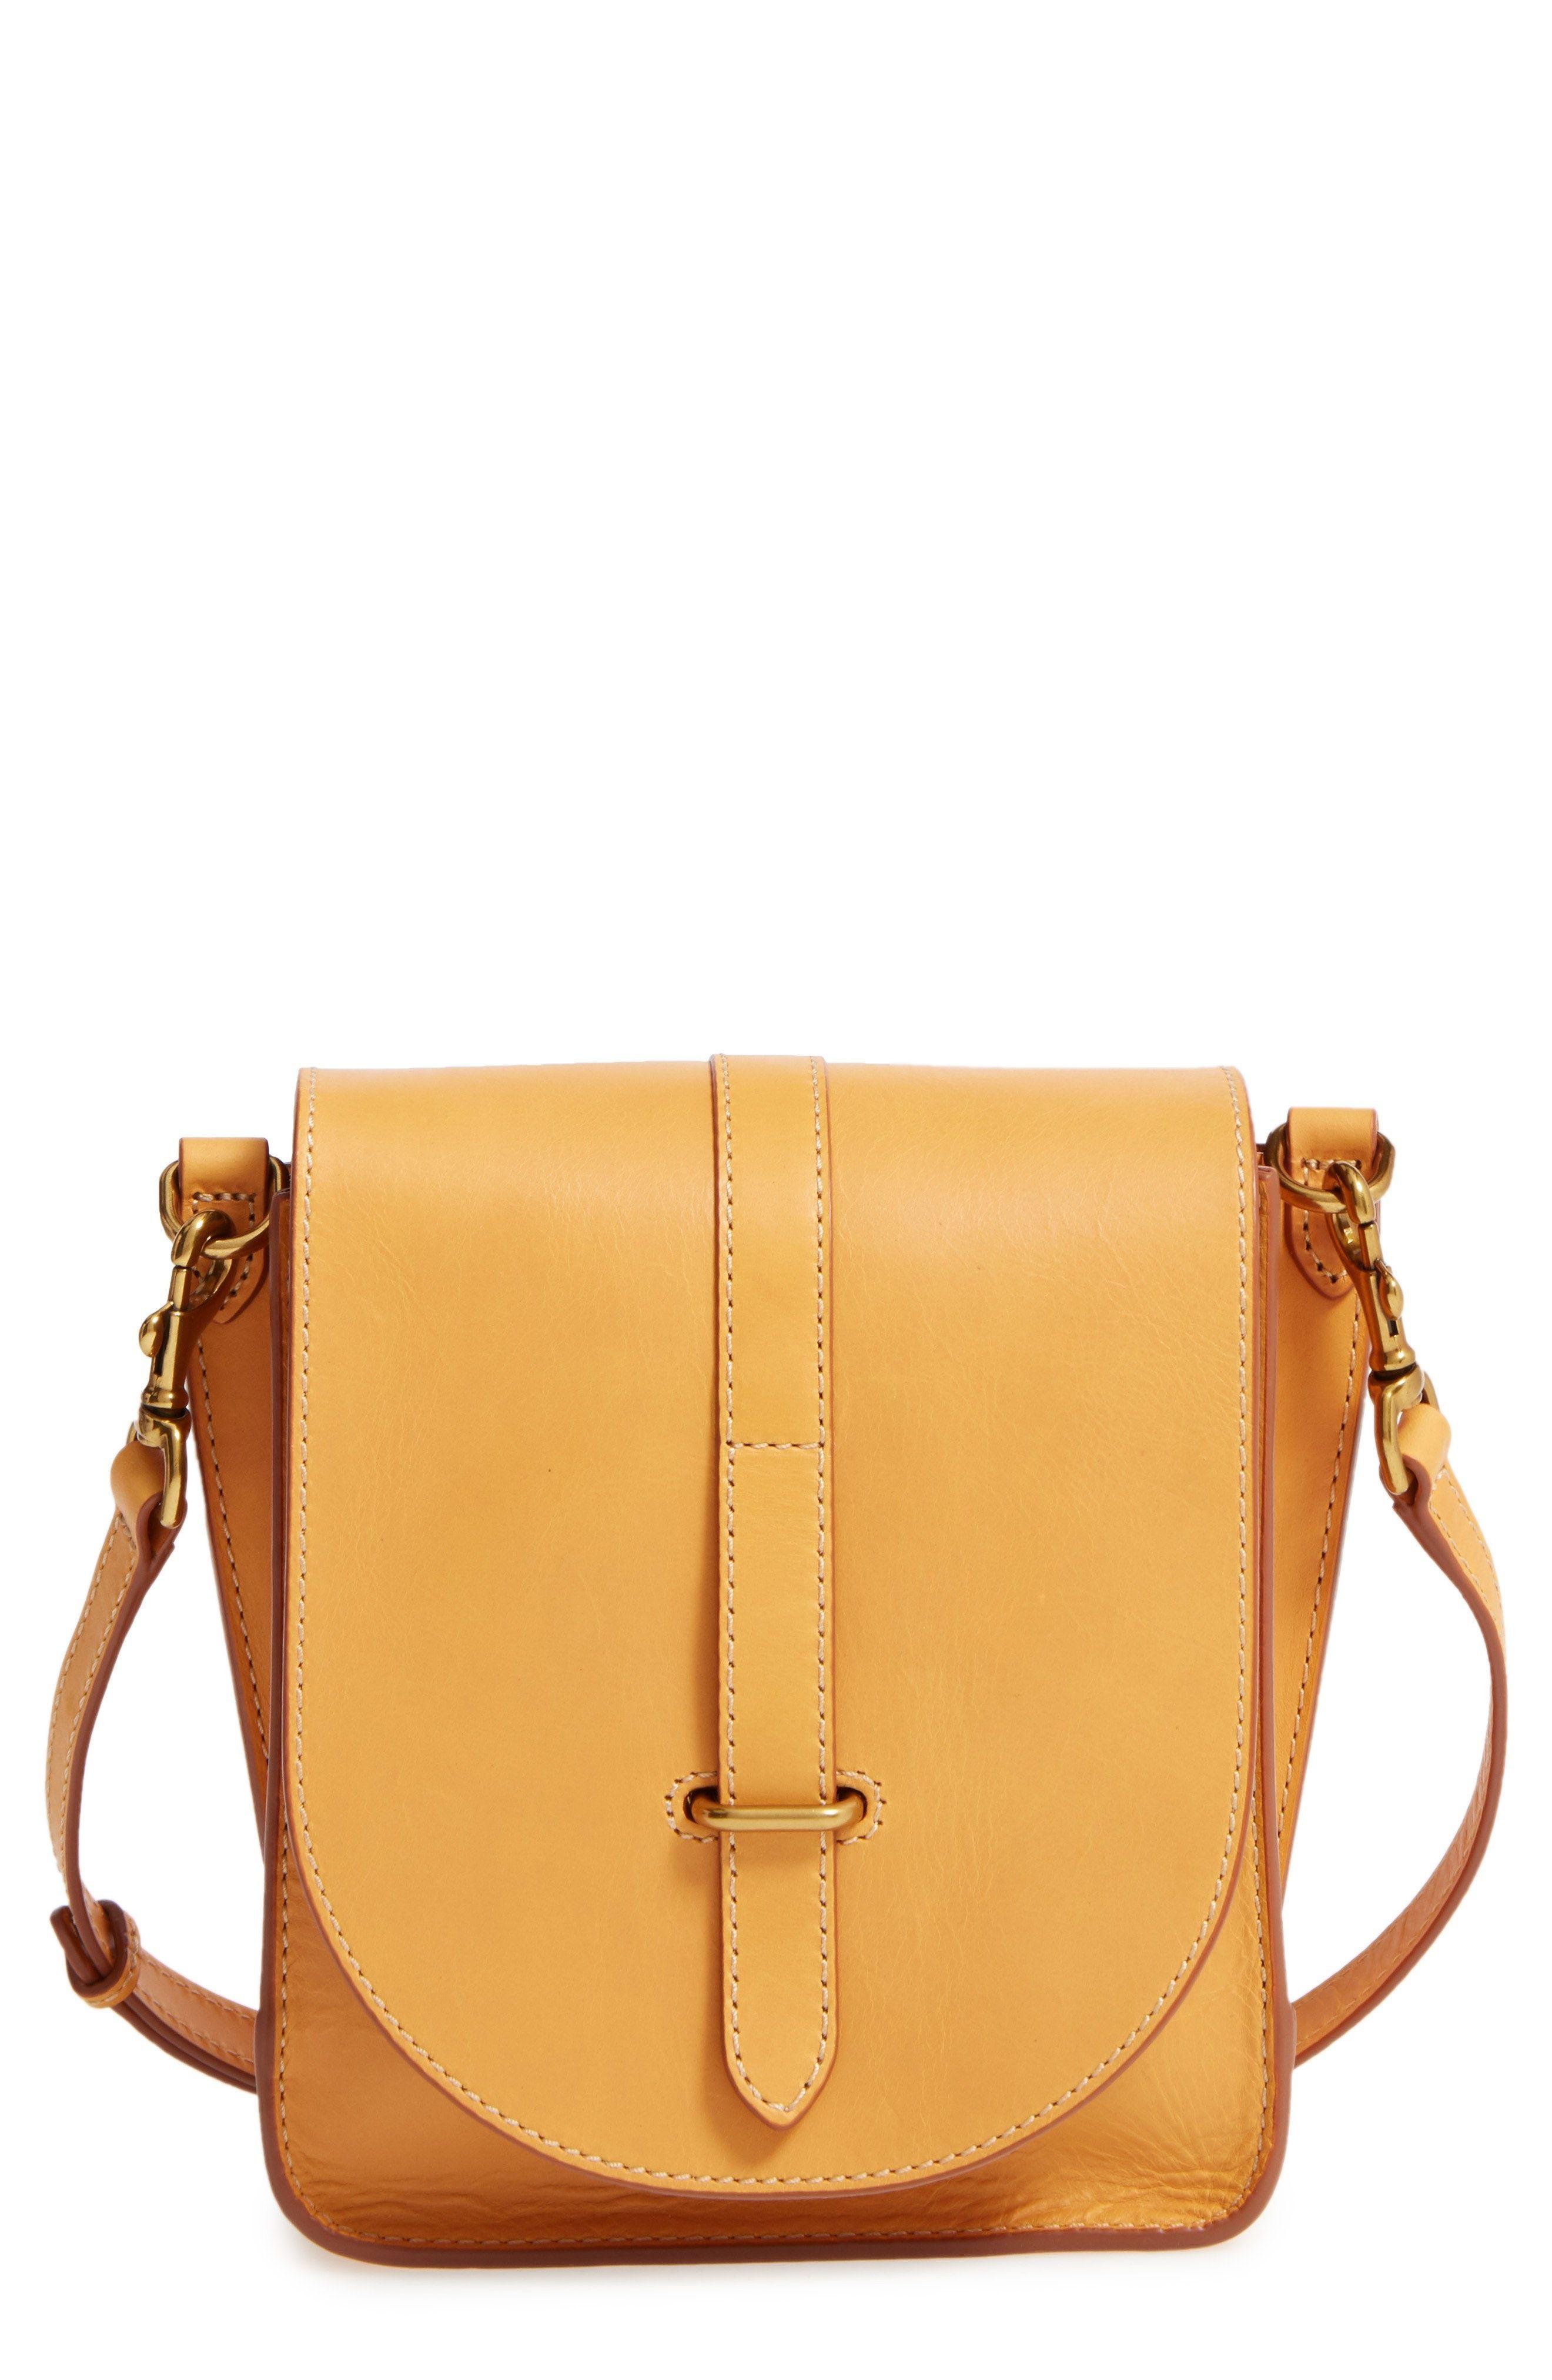 2143c62baa2f New Frye Ilana Leather Crossbody Bag fashion online. [$239.86]?@shop .seehandbags<<